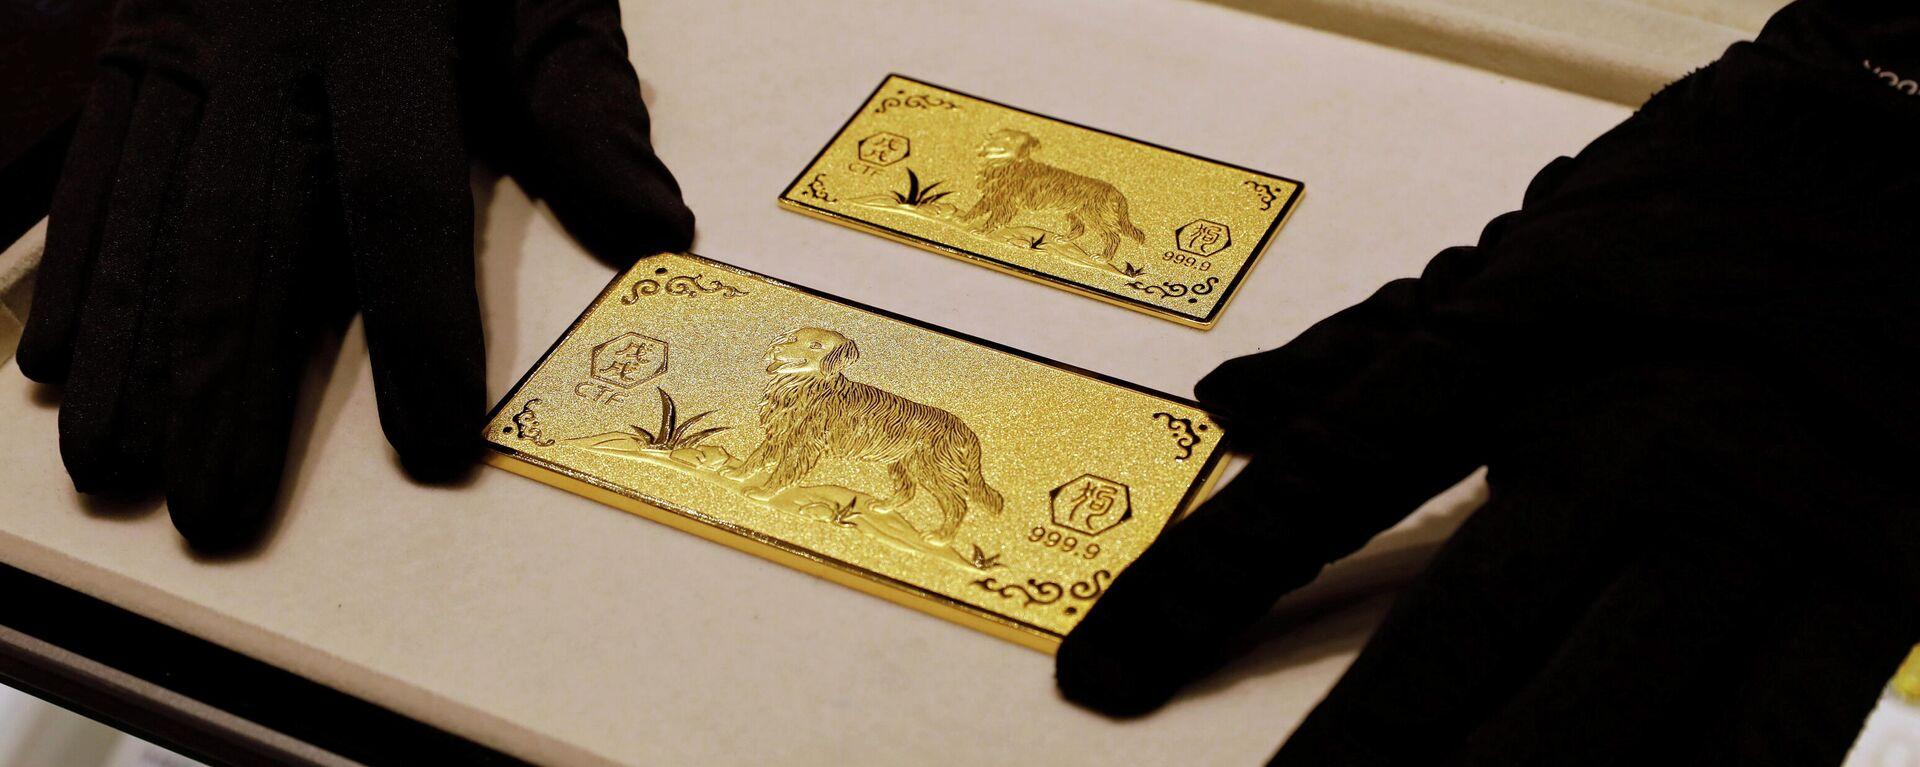 Goldbarren (Symbolbild) - SNA, 1920, 29.05.2021